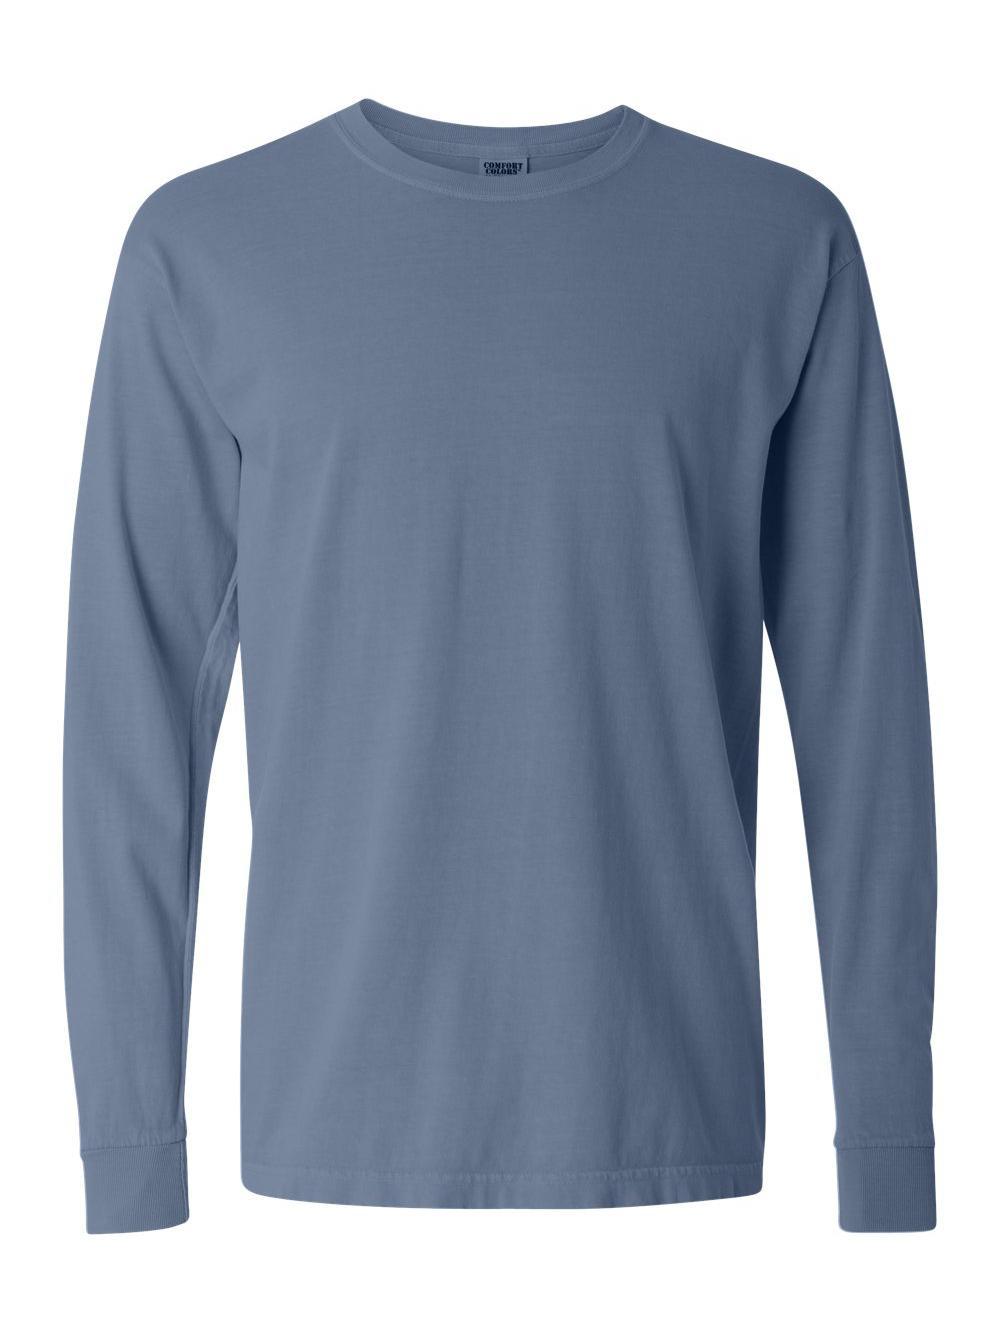 Comfort-Colors-Garment-Dyed-Heavyweight-Ringspun-Long-Sleeve-T-Shirt-6014 thumbnail 12